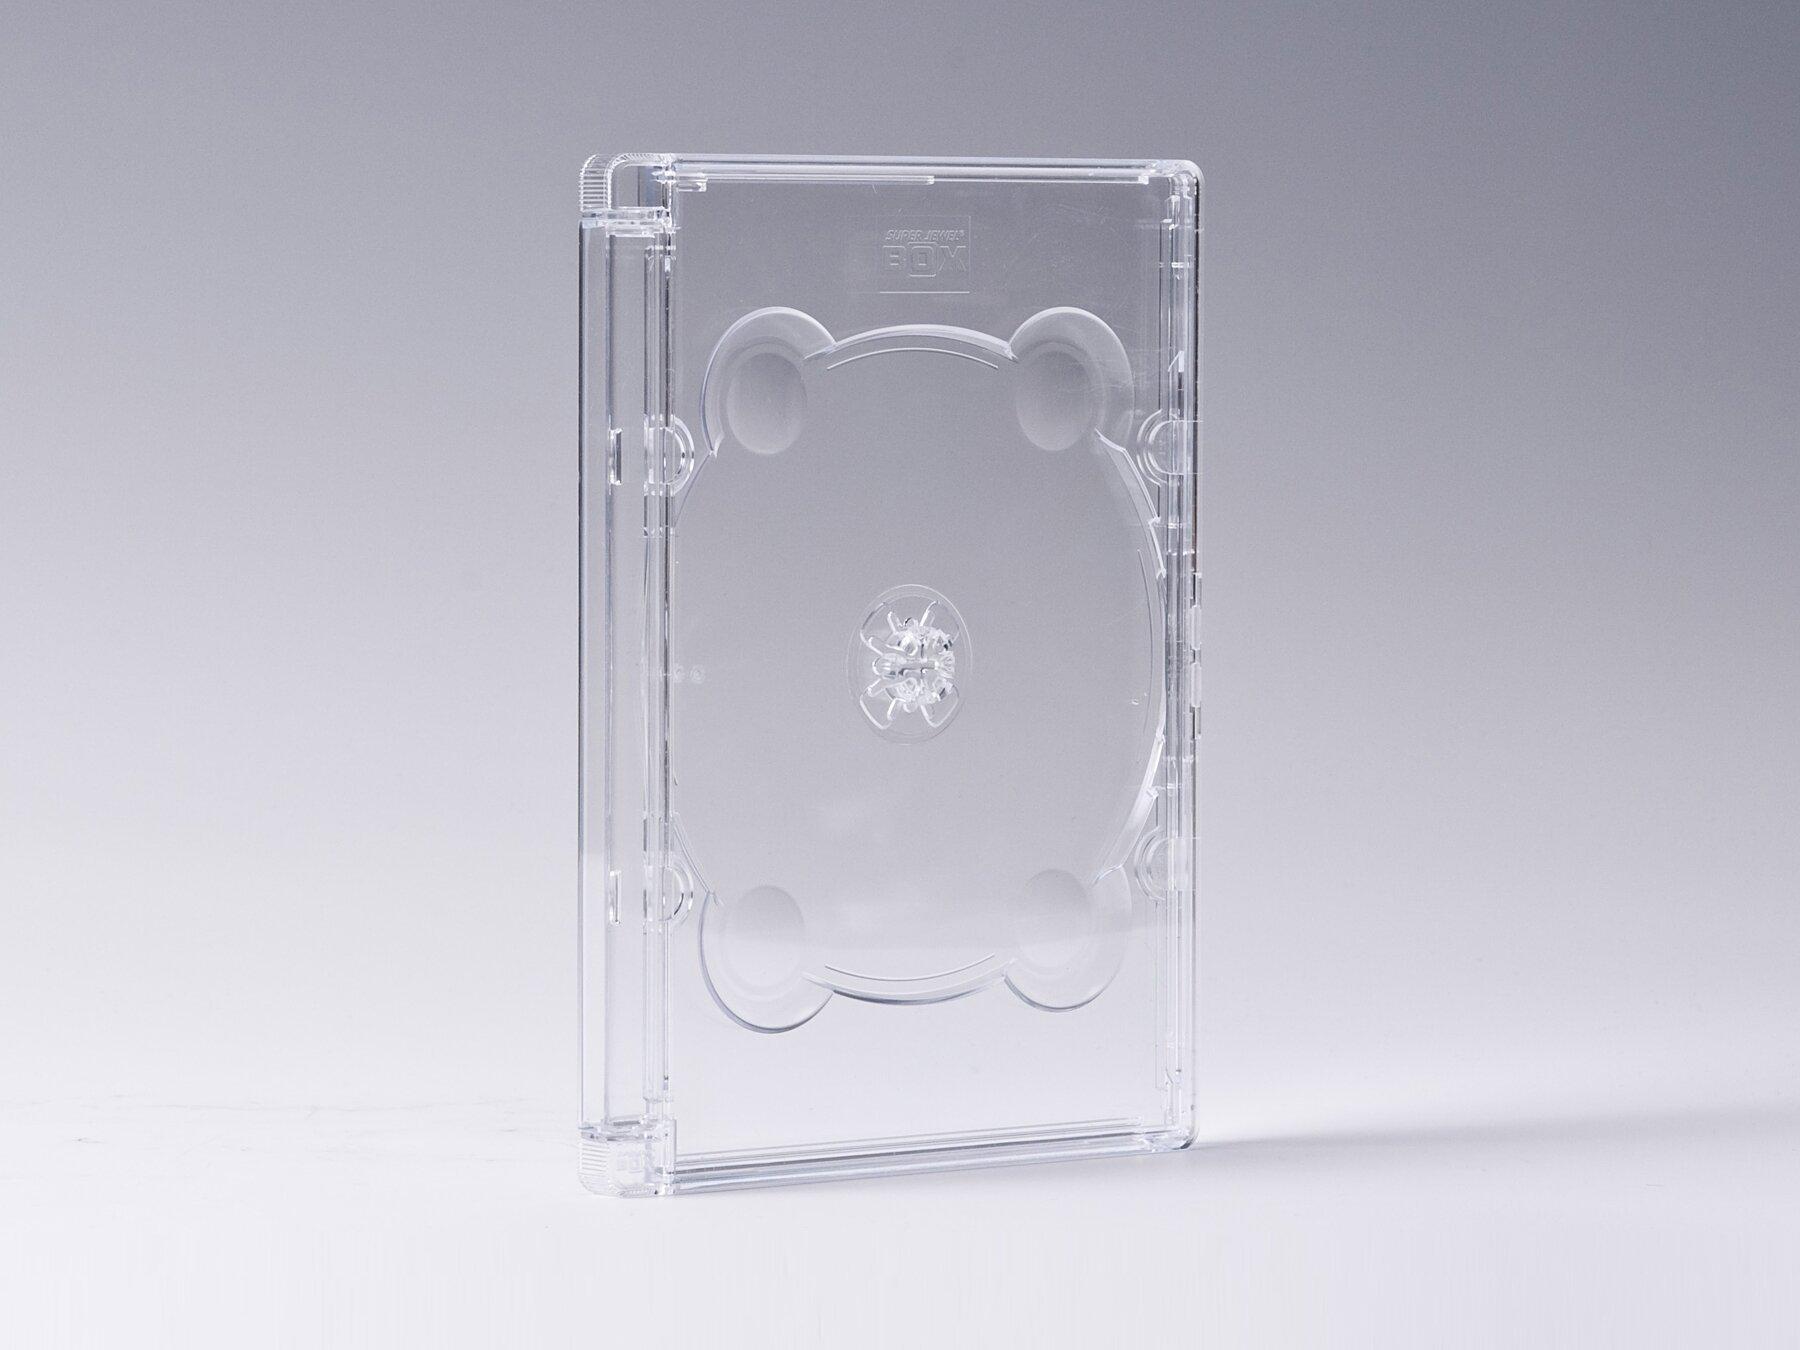 Super jewel box, бокс хрустальный - фото pic_fb516bcd3e9f38a_1920x9000_1.jpg